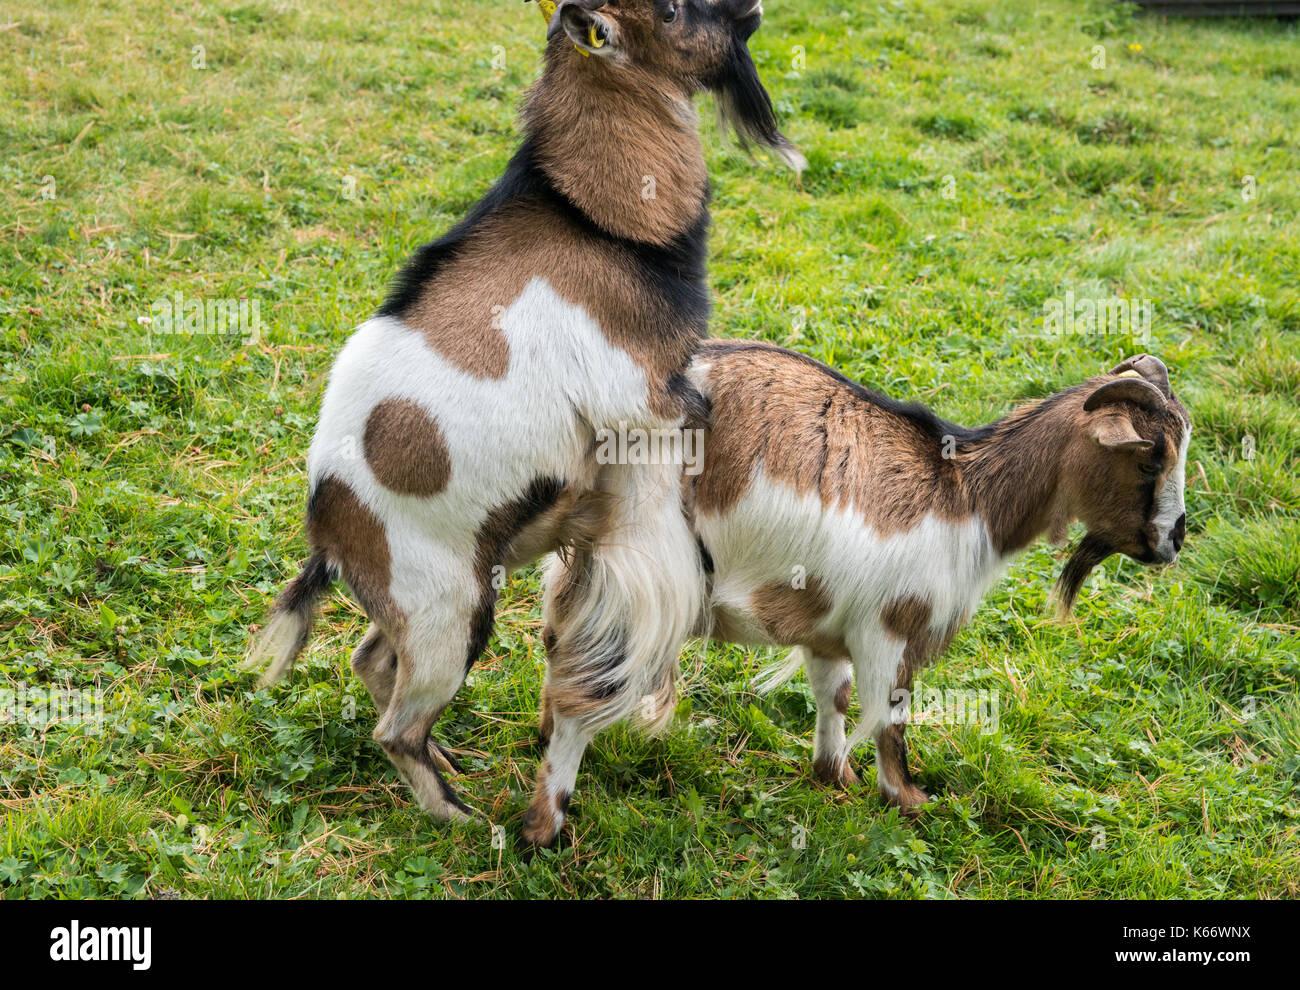 goats-procreating-K66WNX.jpg